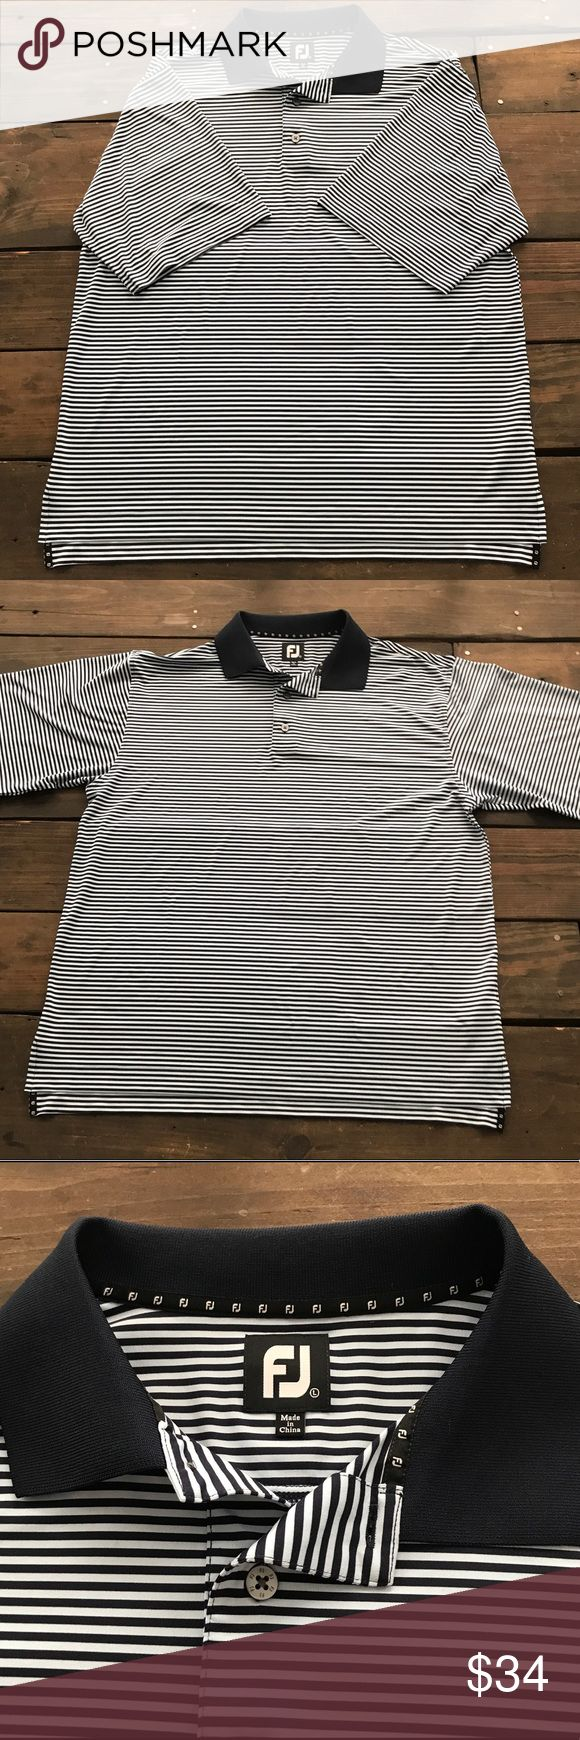 "FootJoy Blue Striped Golf Polo Shirt Men's FootJoy Golf Polo Shirt Light Blue & Dark Blue Stripes Size Large 24"" underarm to underarm measured flat  29"" long FootJoy Shirts Polos"